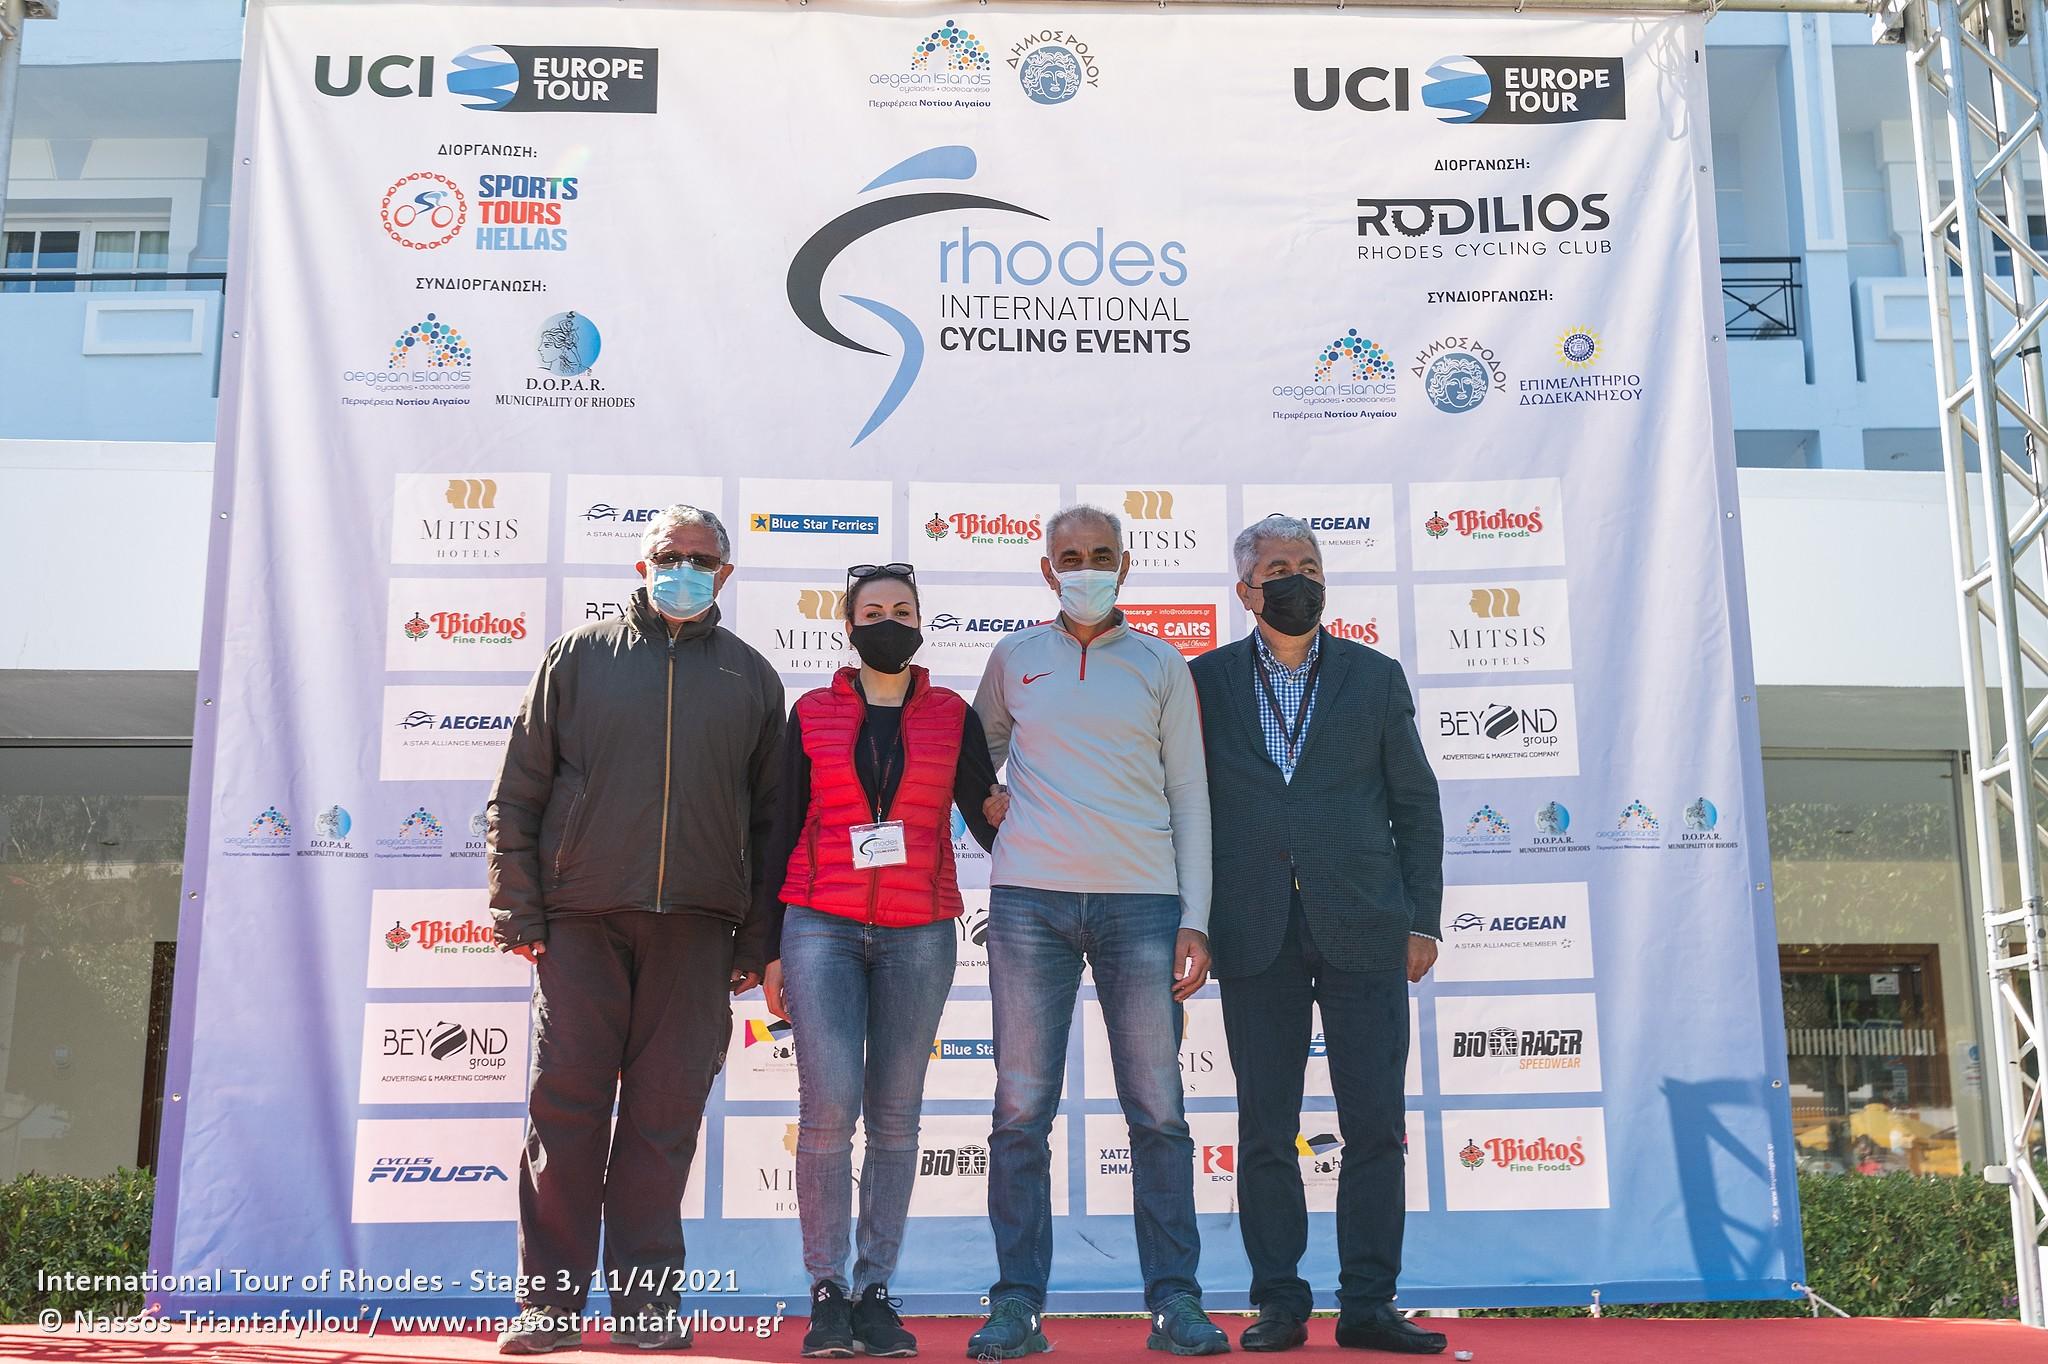 video Ο πρωτεργάτης των αγώνων ποδηλασίας Γ. Παπασταματάκης μίλησε στο in12